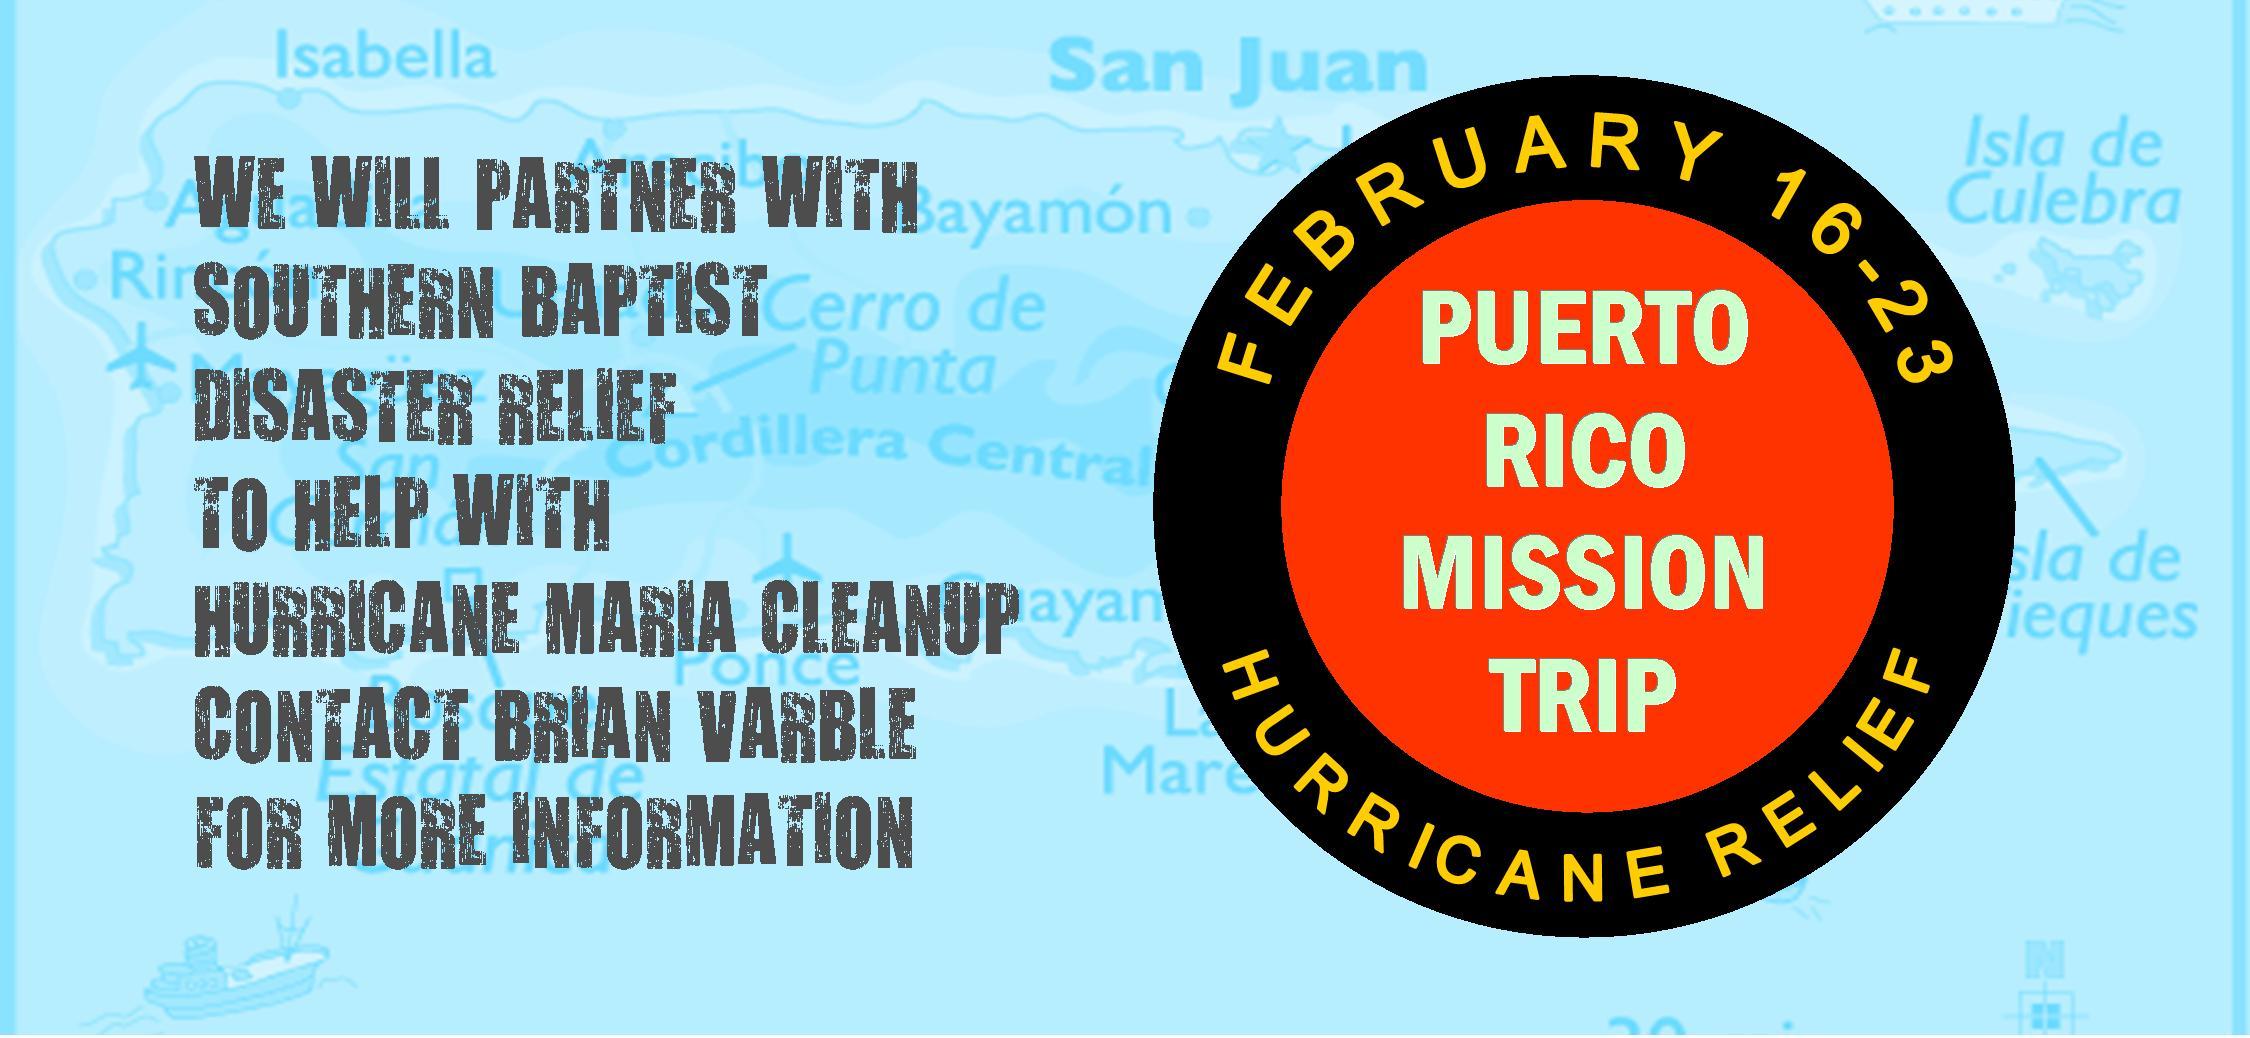 Puerto Rico Mission Trip  120517.jpg